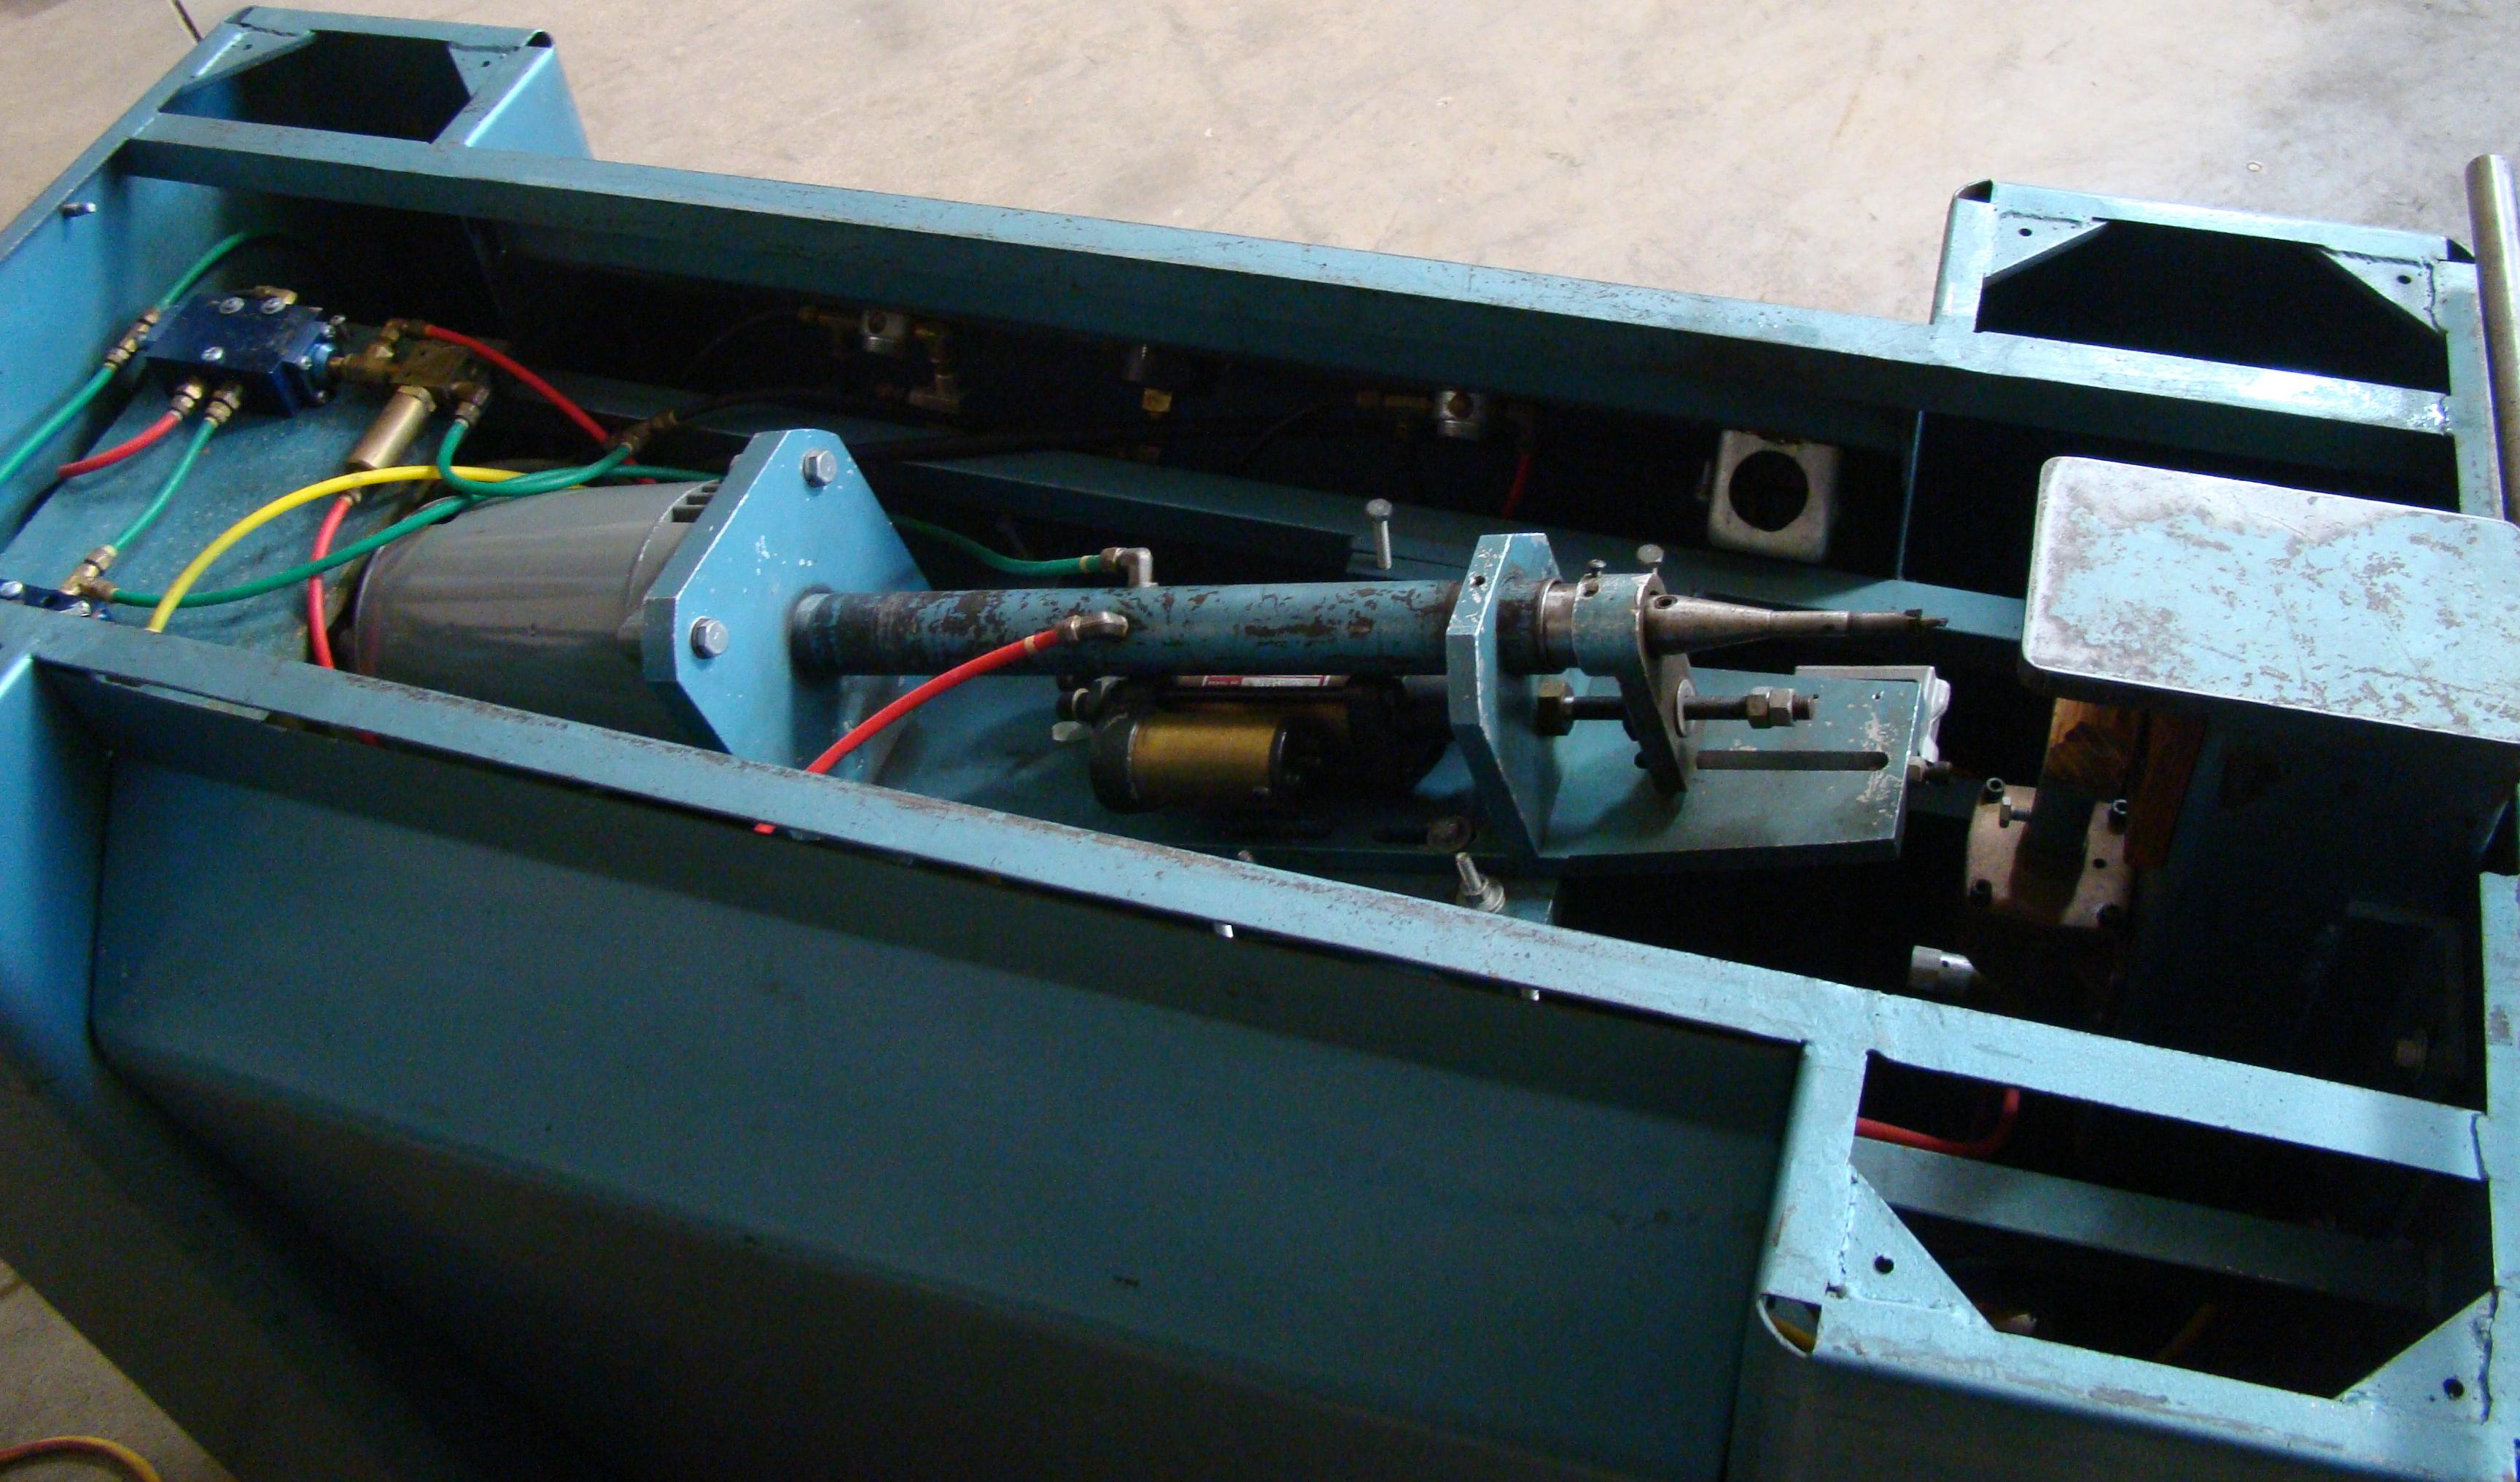 Unique Machine 1 Spindle Pocket Boring Machine, 115 Volts (On Wheels) - Image 2 of 4